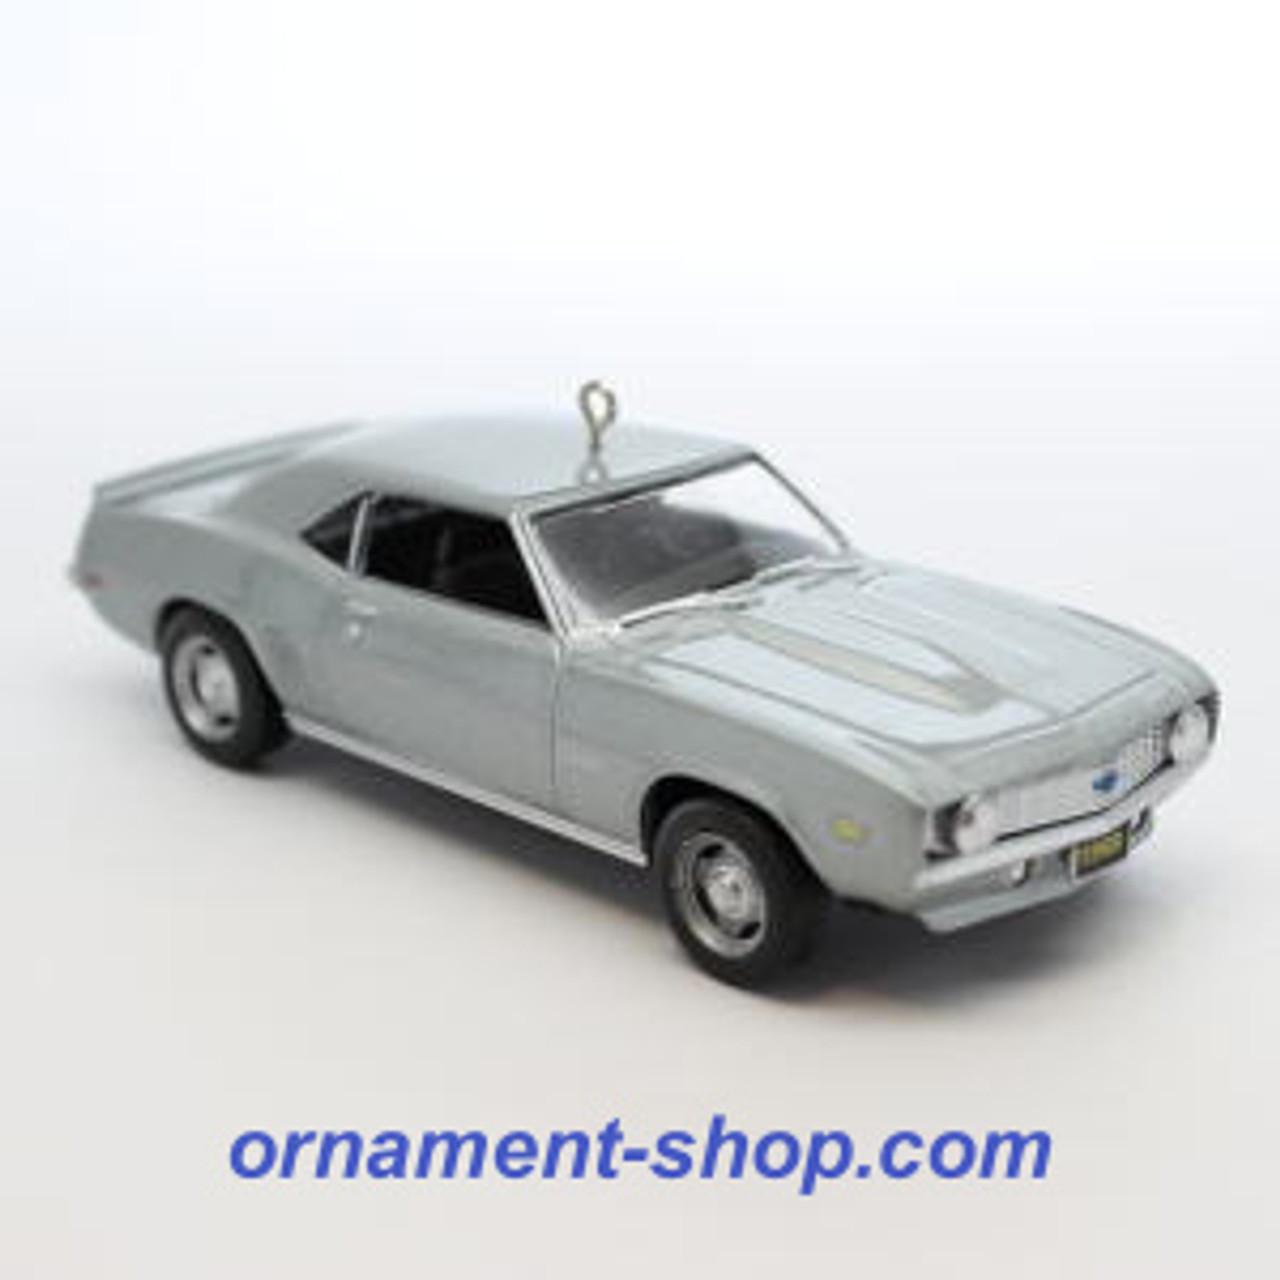 white 1969 Chevrolet Camaro SS Ornament Kiddie Car Hallmark